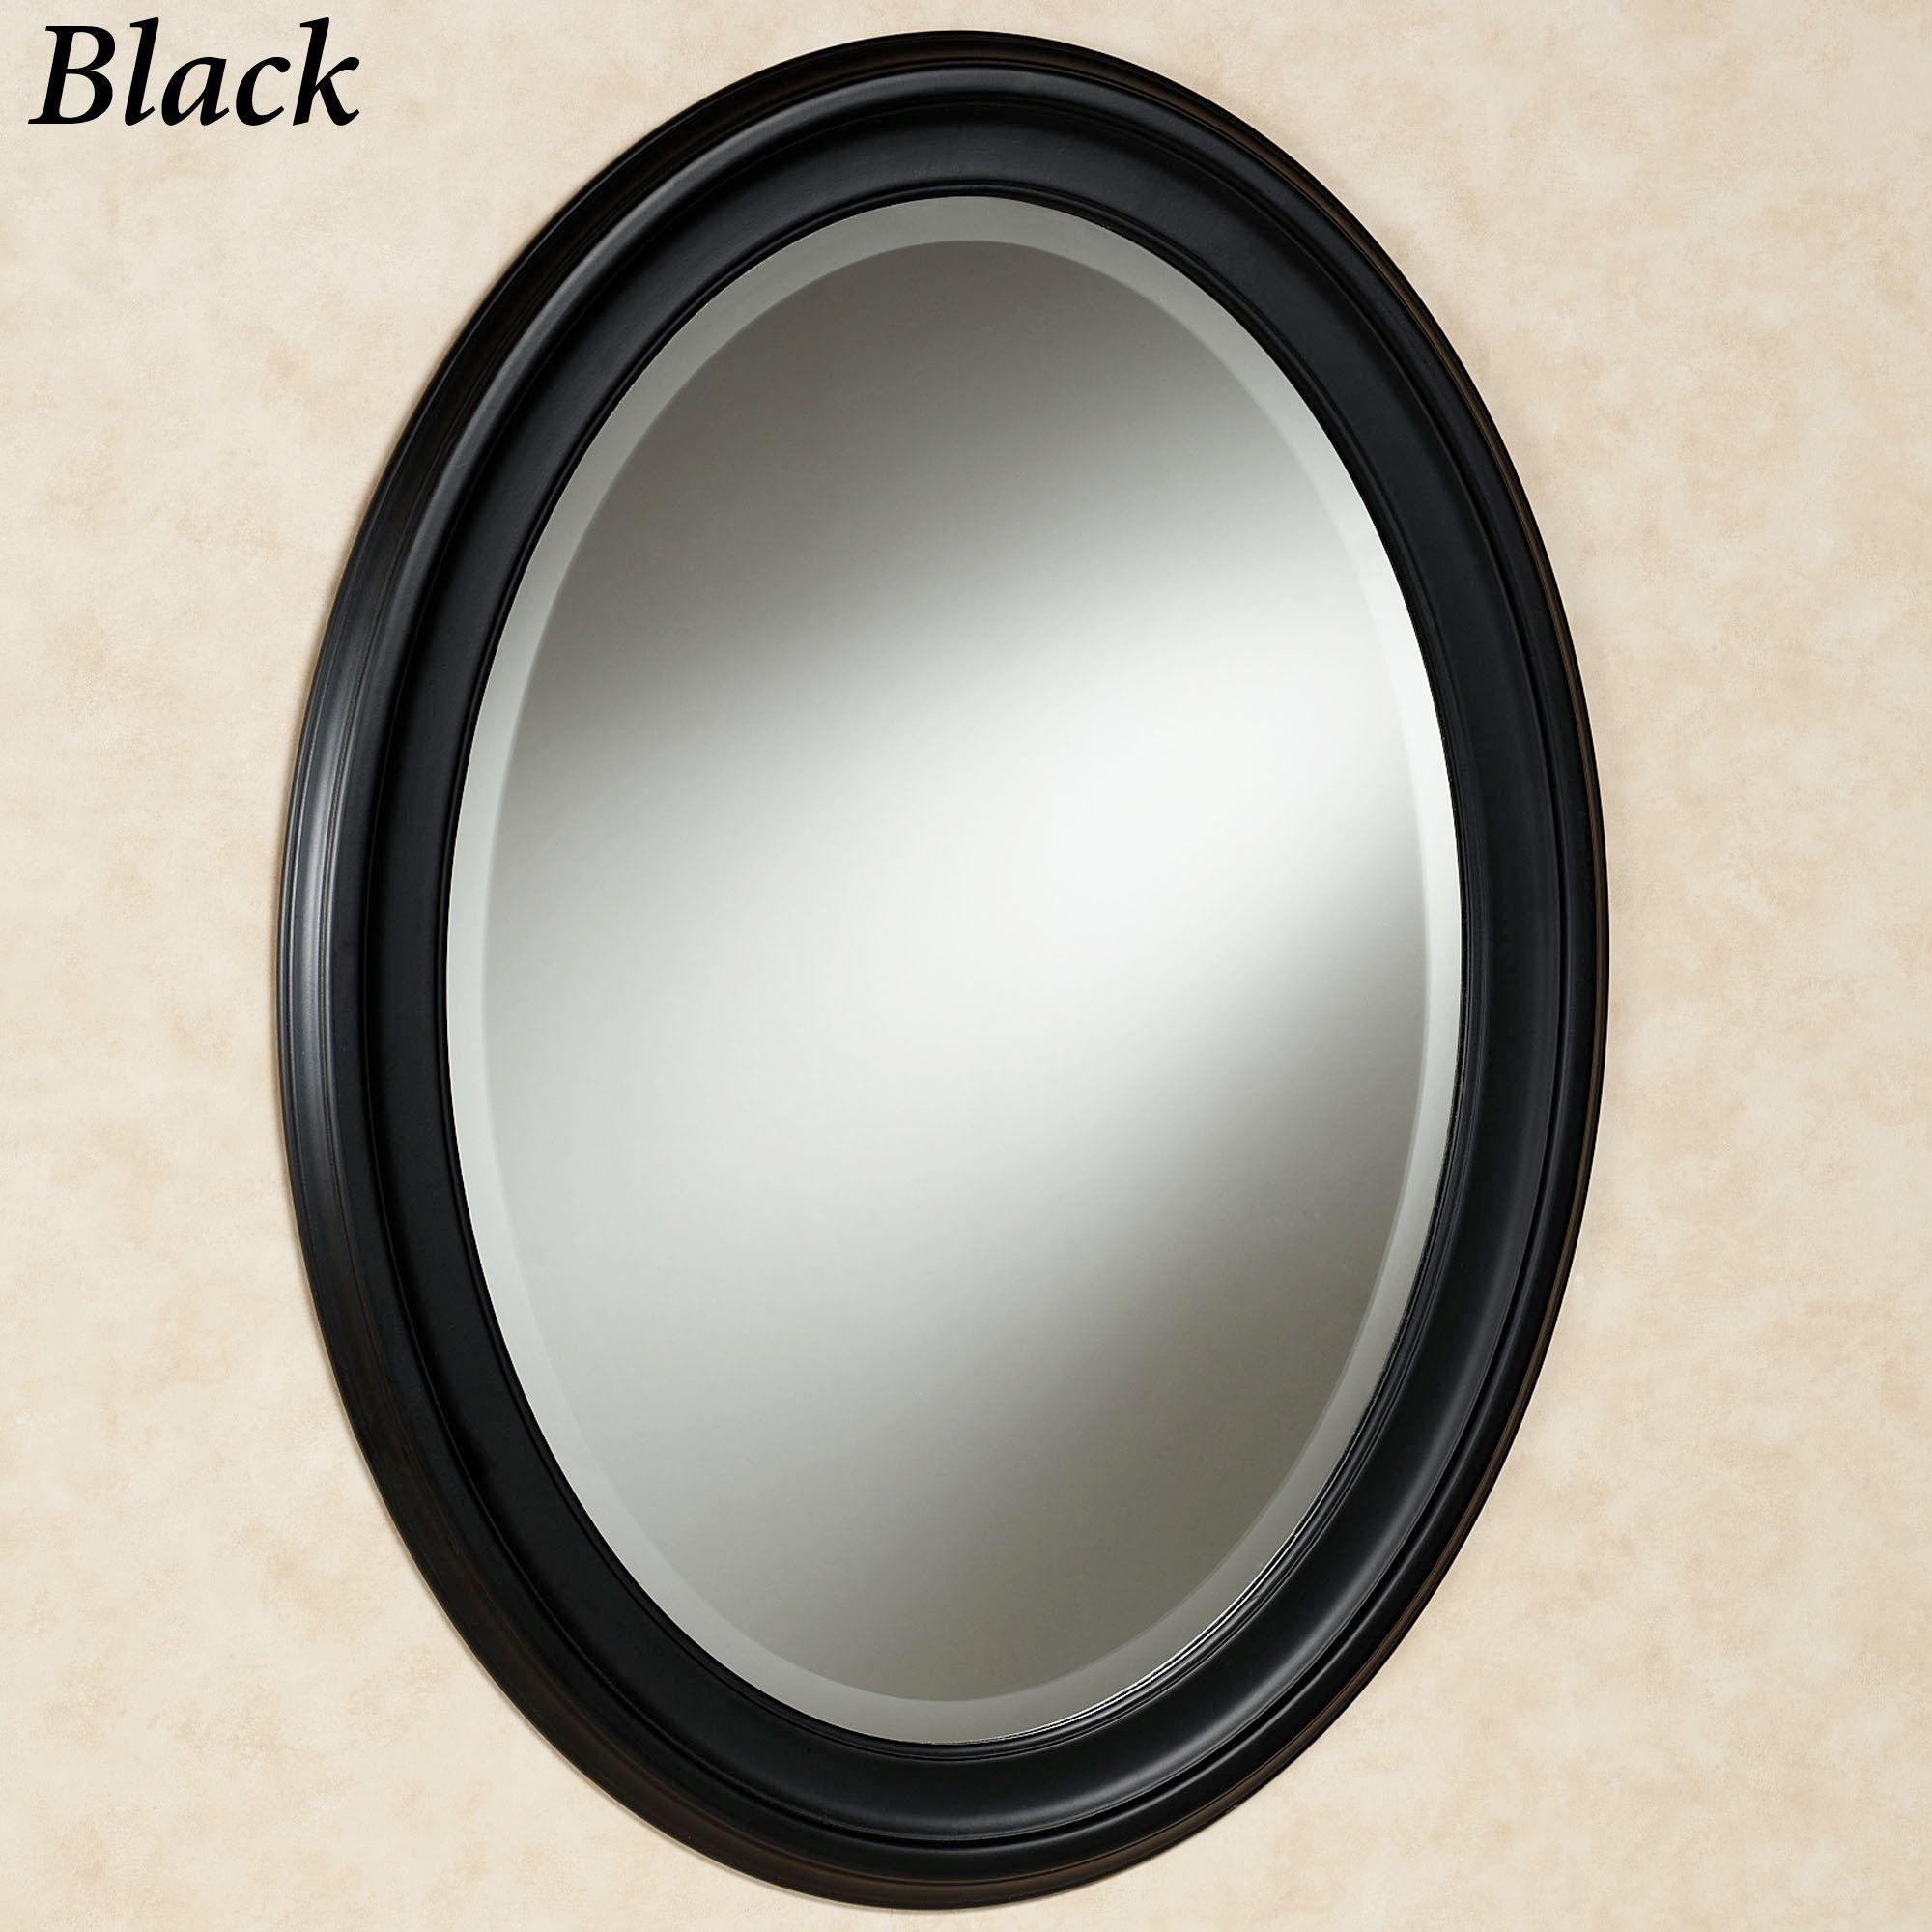 Loree Black Oval Wall Mirror